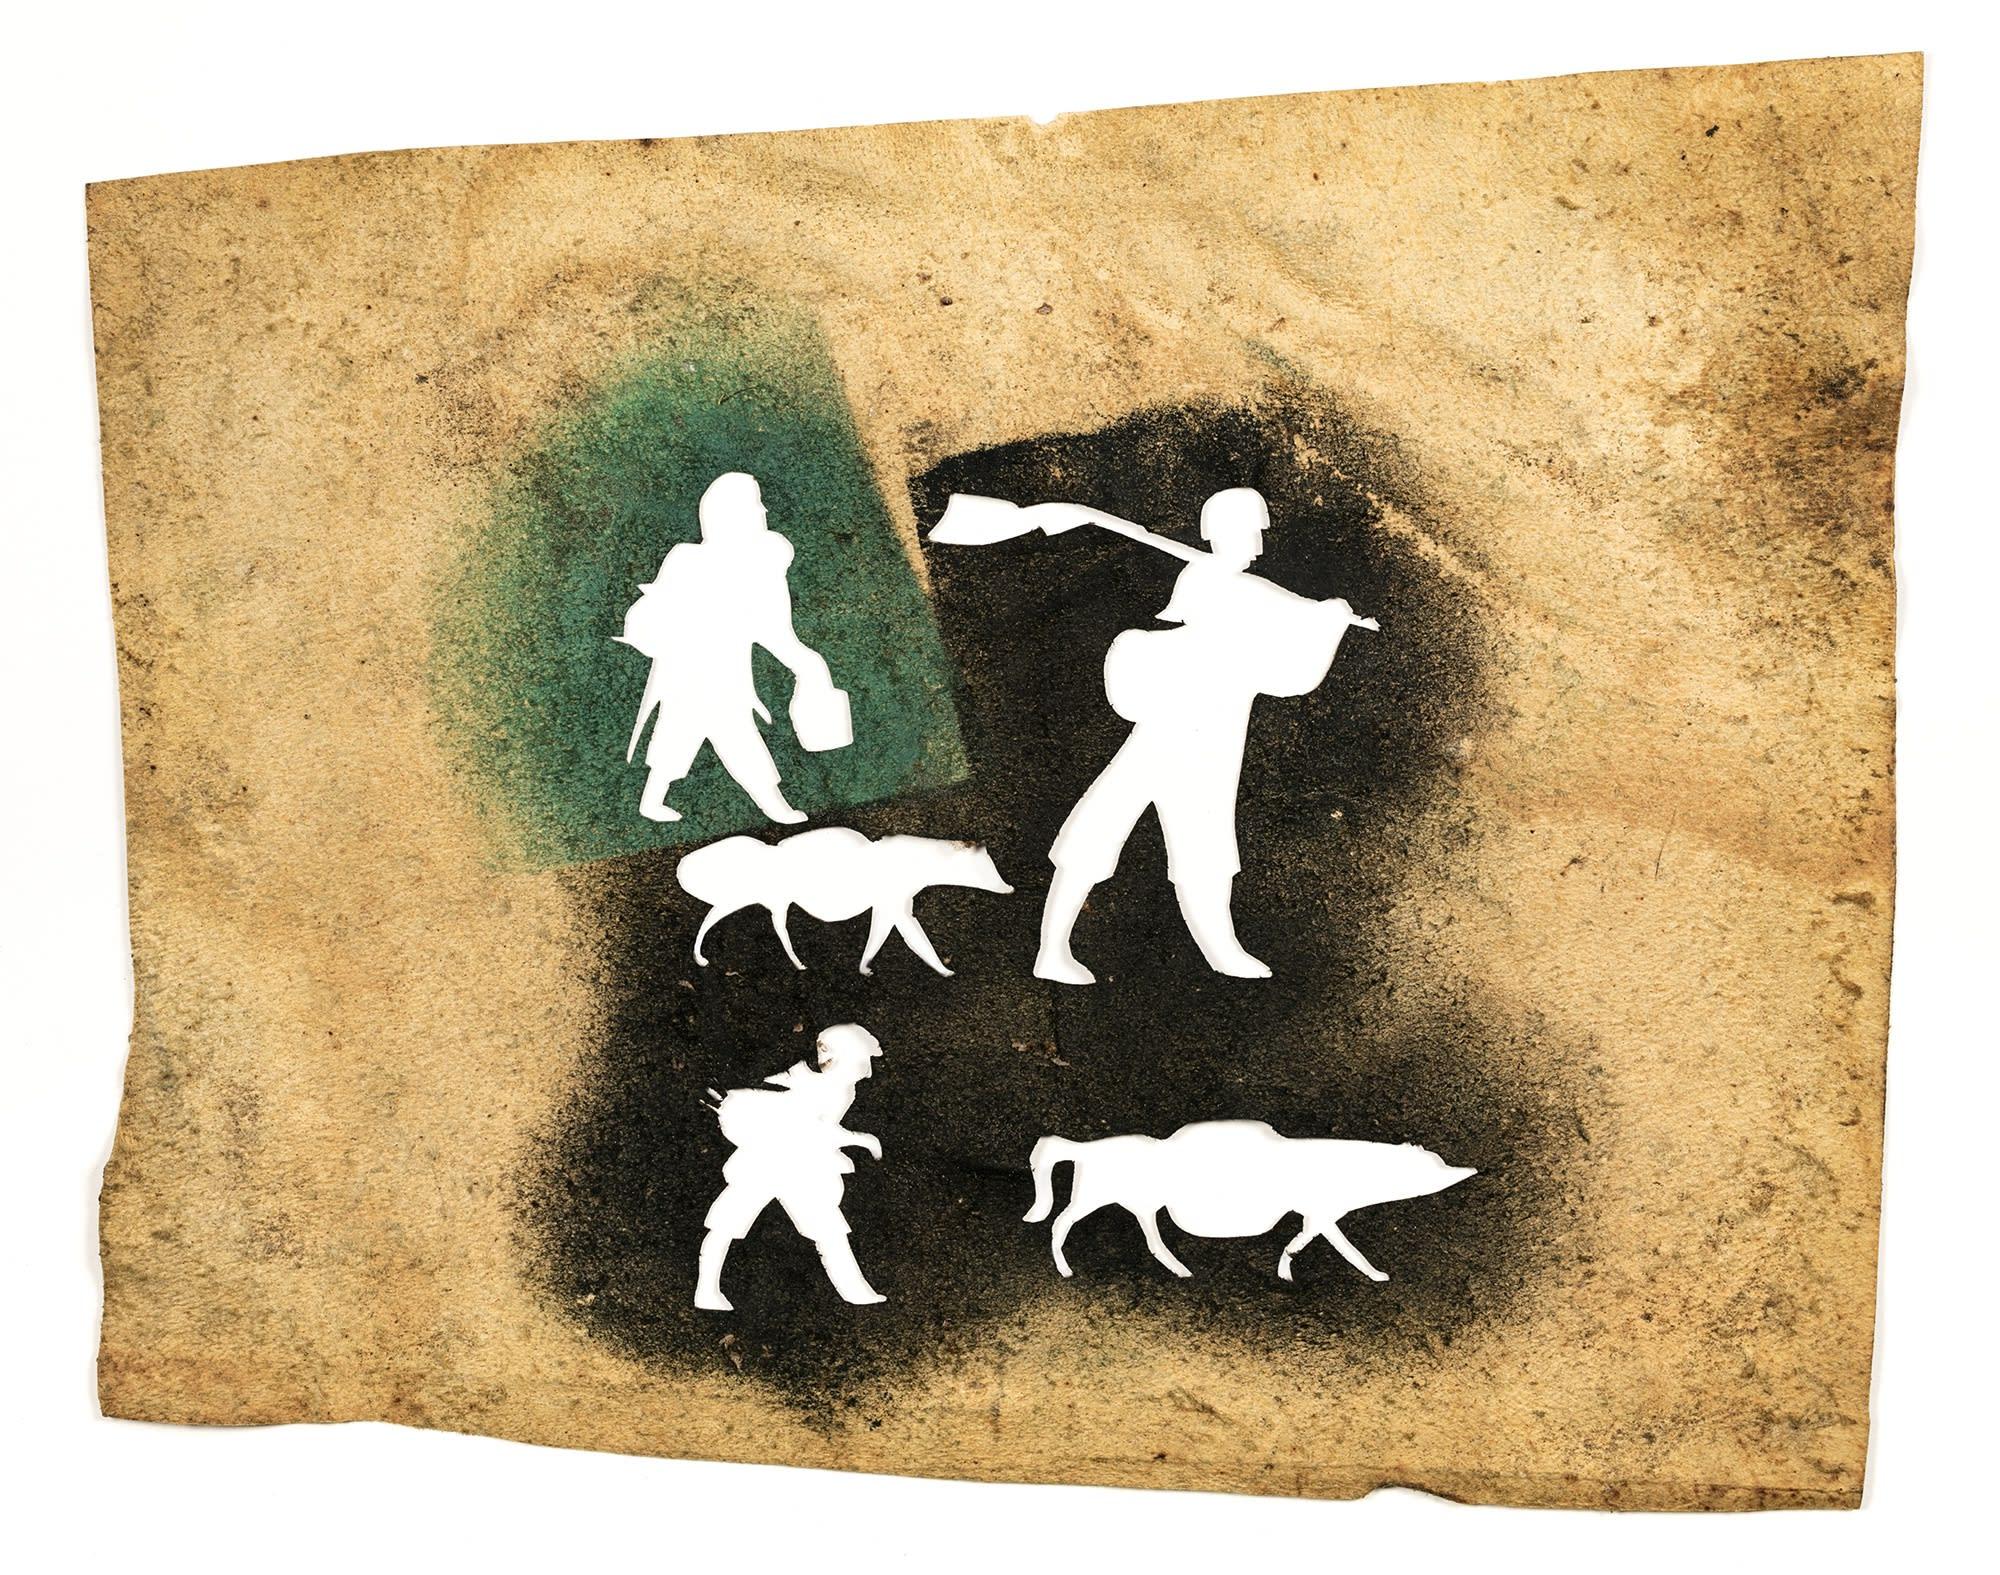 Lot 61, Niviaqsi, The Family Hunting